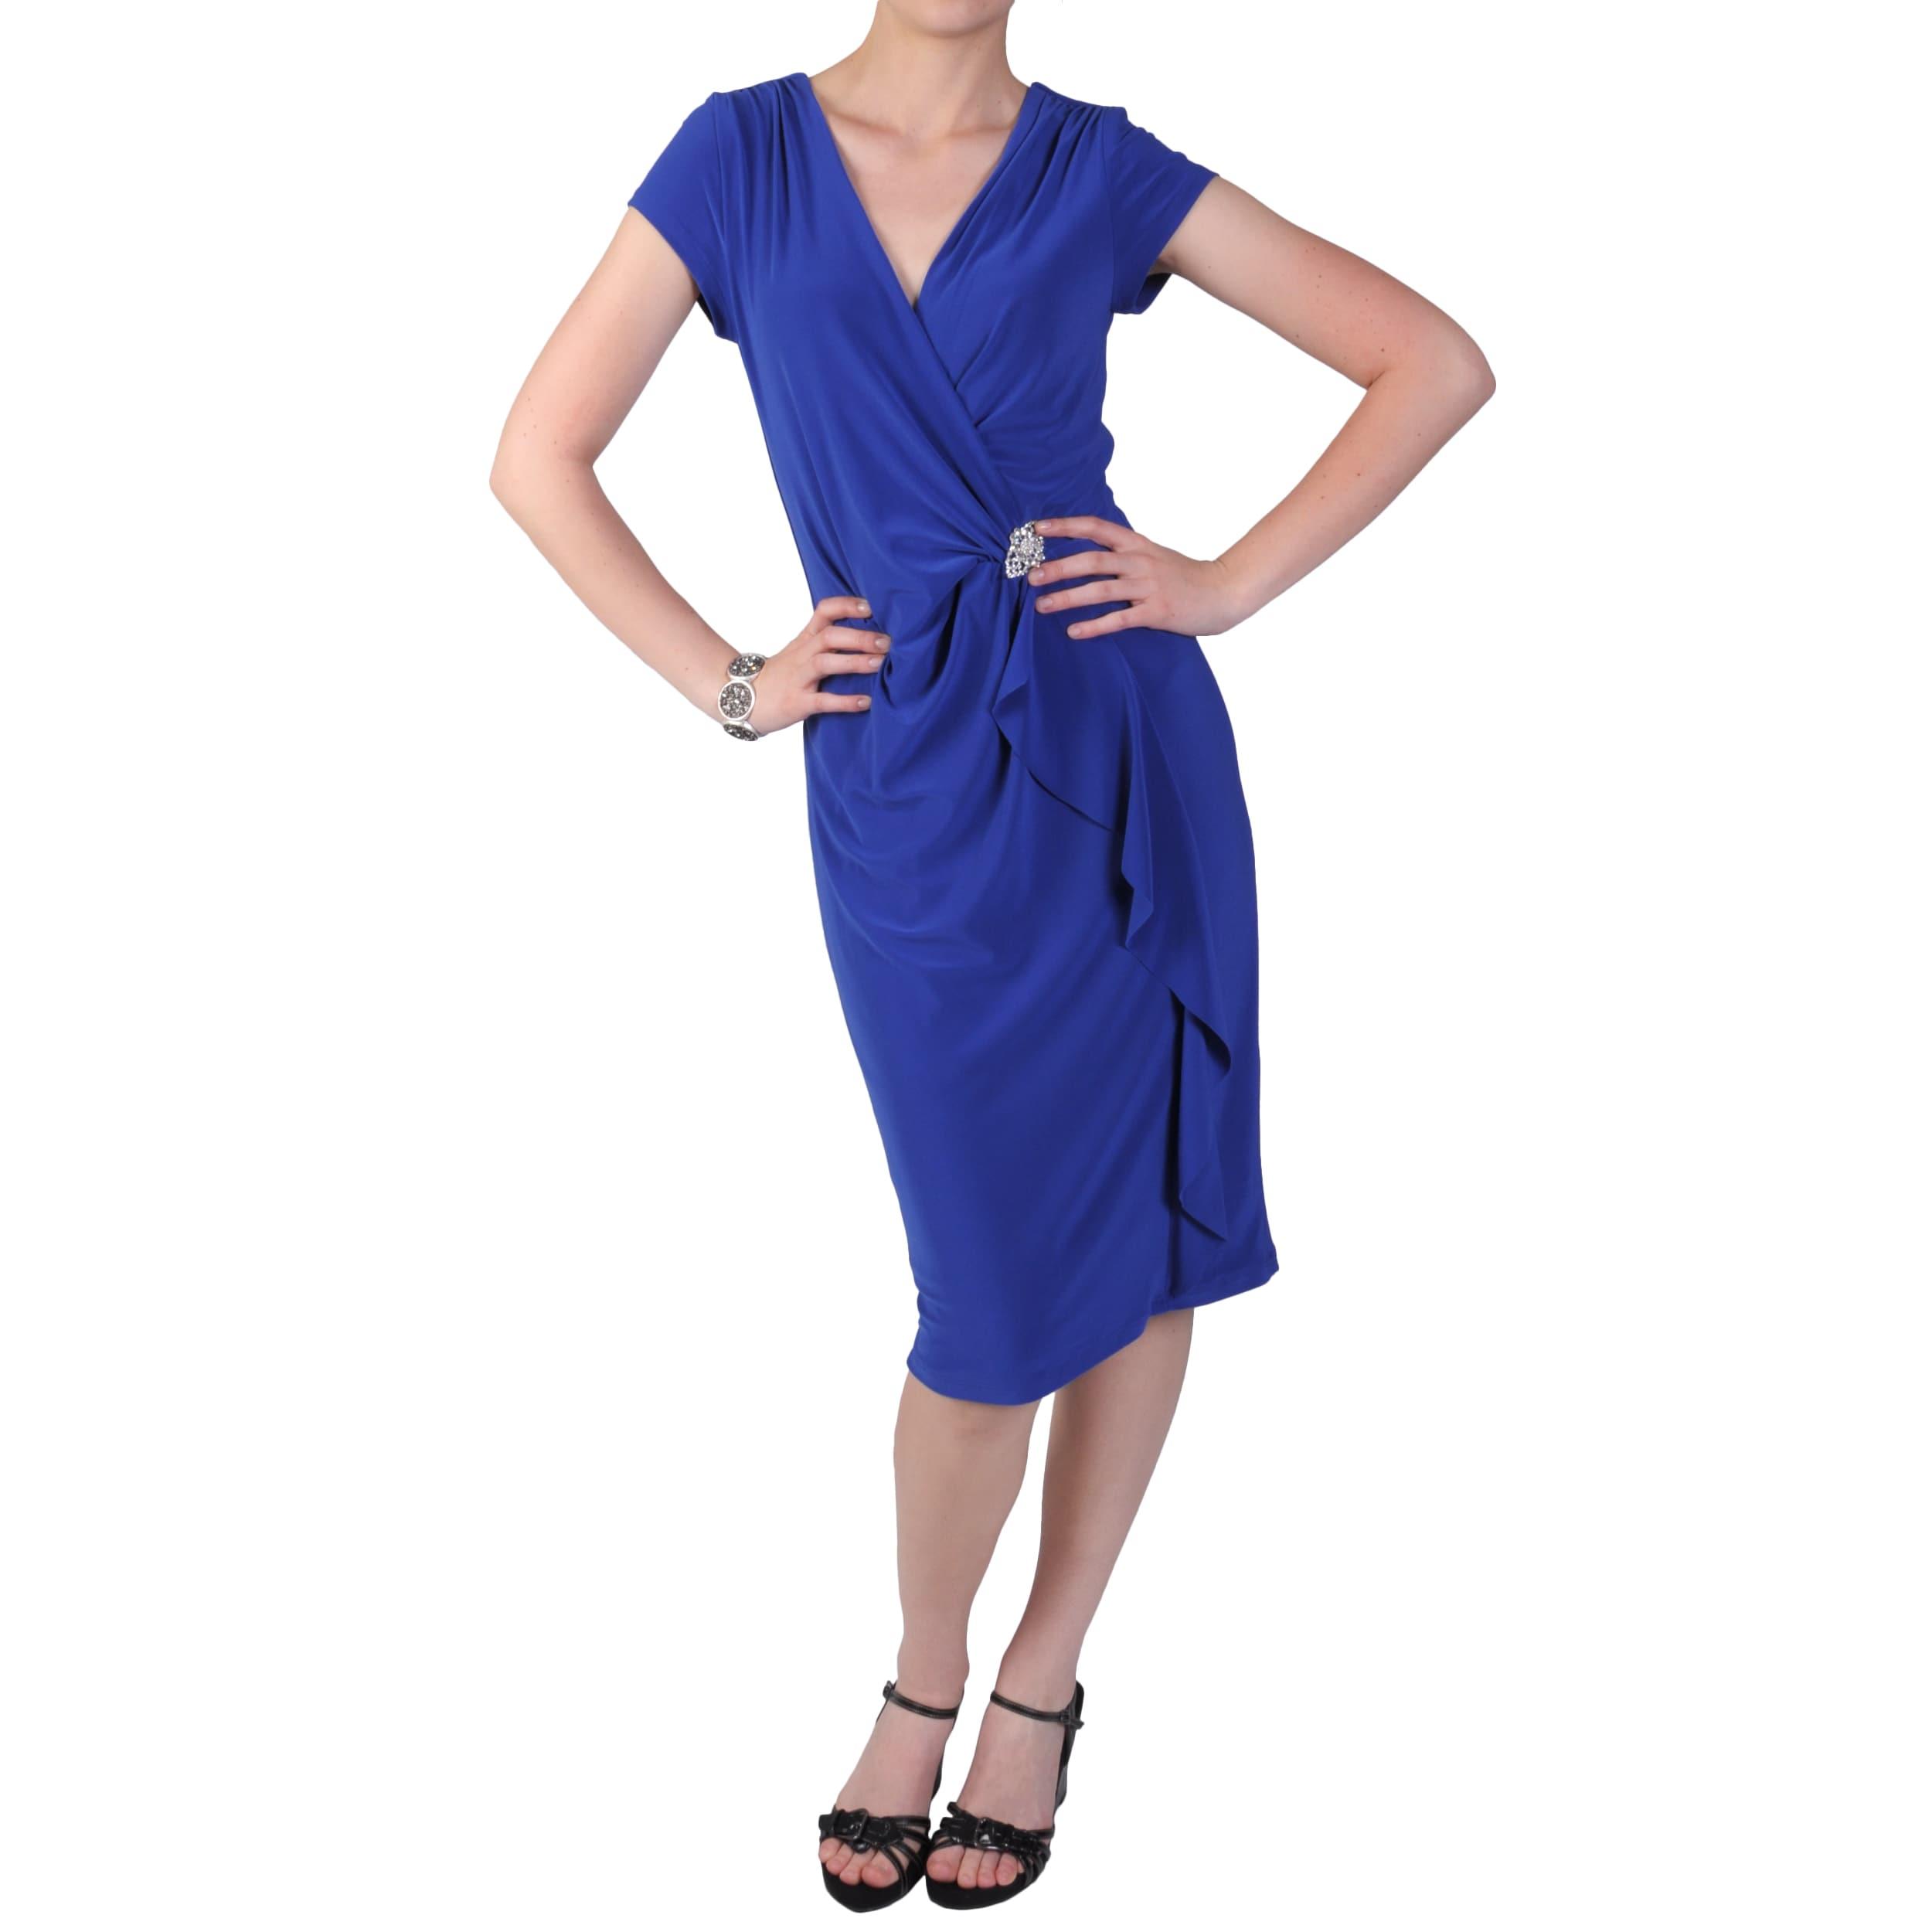 Tressa Designs Women's Size L Ruffled V-neck Dress